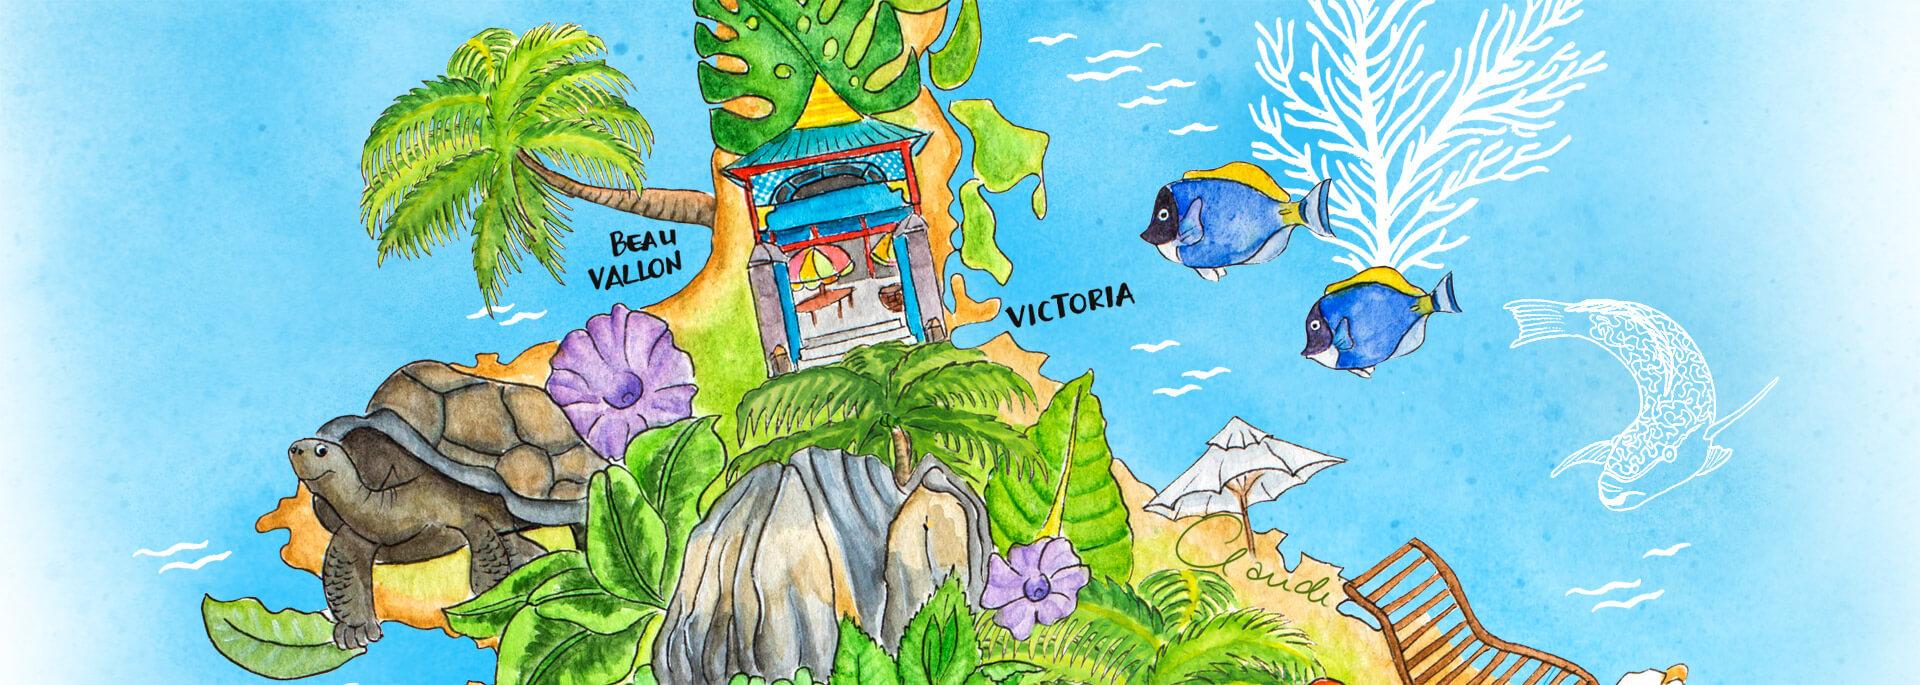 Kalender Illustrierte Inseln 2017 – Mai: Seychellen-Insel Mahé